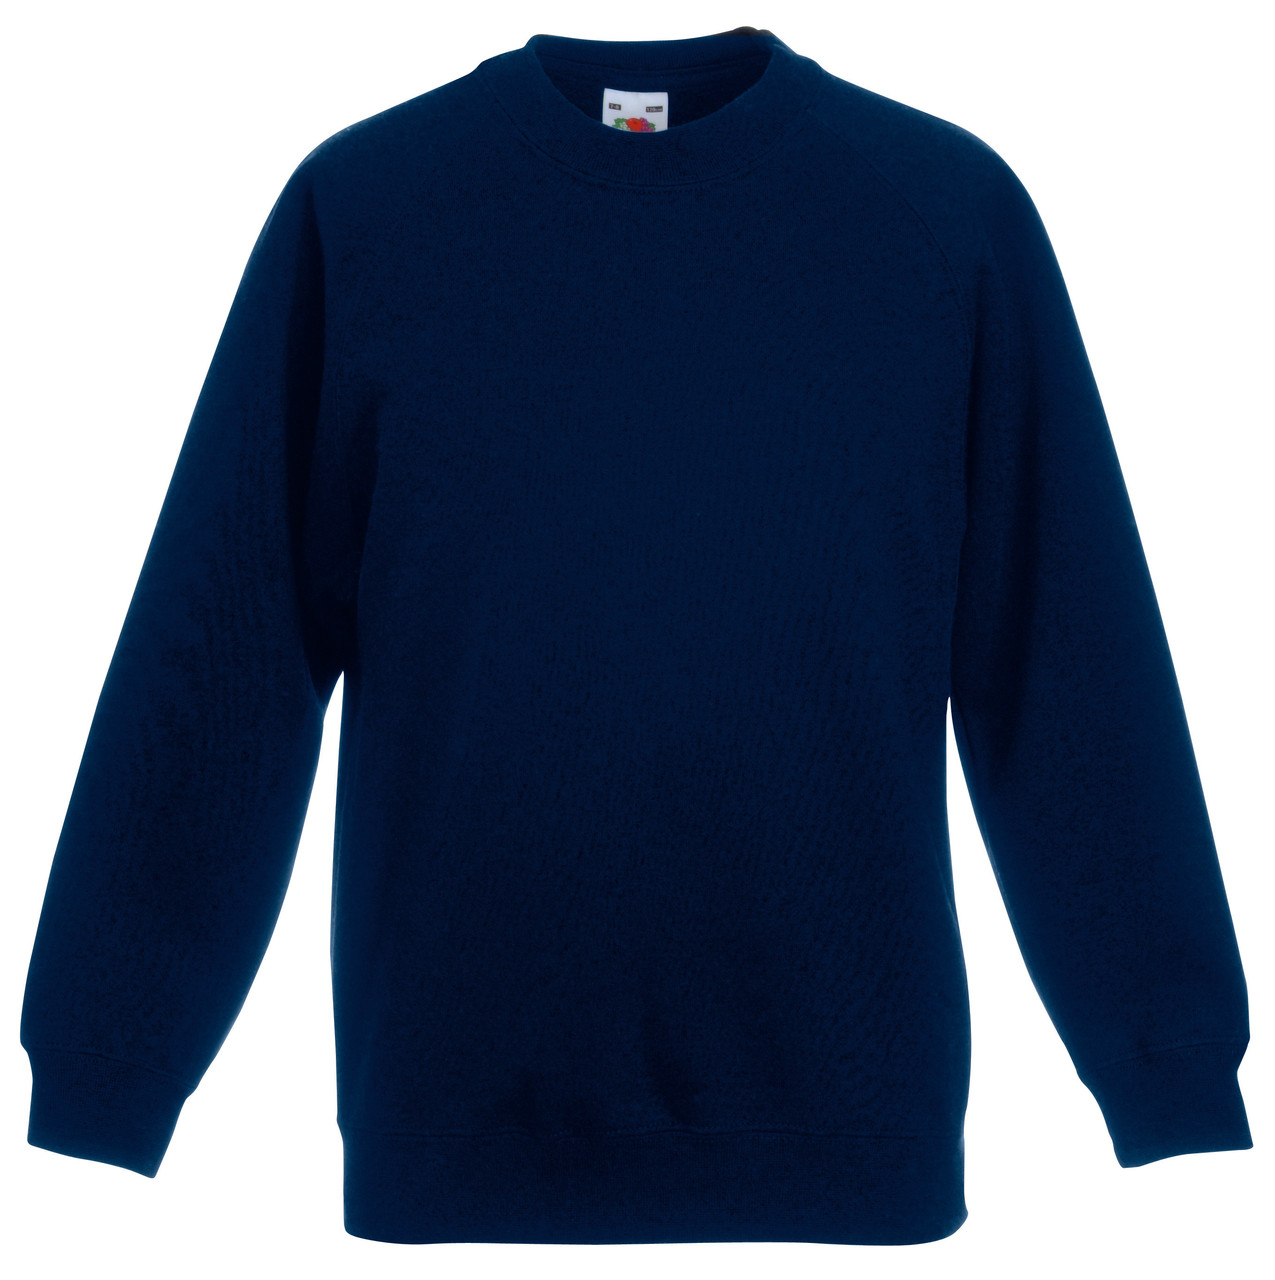 Детский классический реглан Глубокий тёмно-синий Fruit Of The Loom 62-039-AZ 3-4